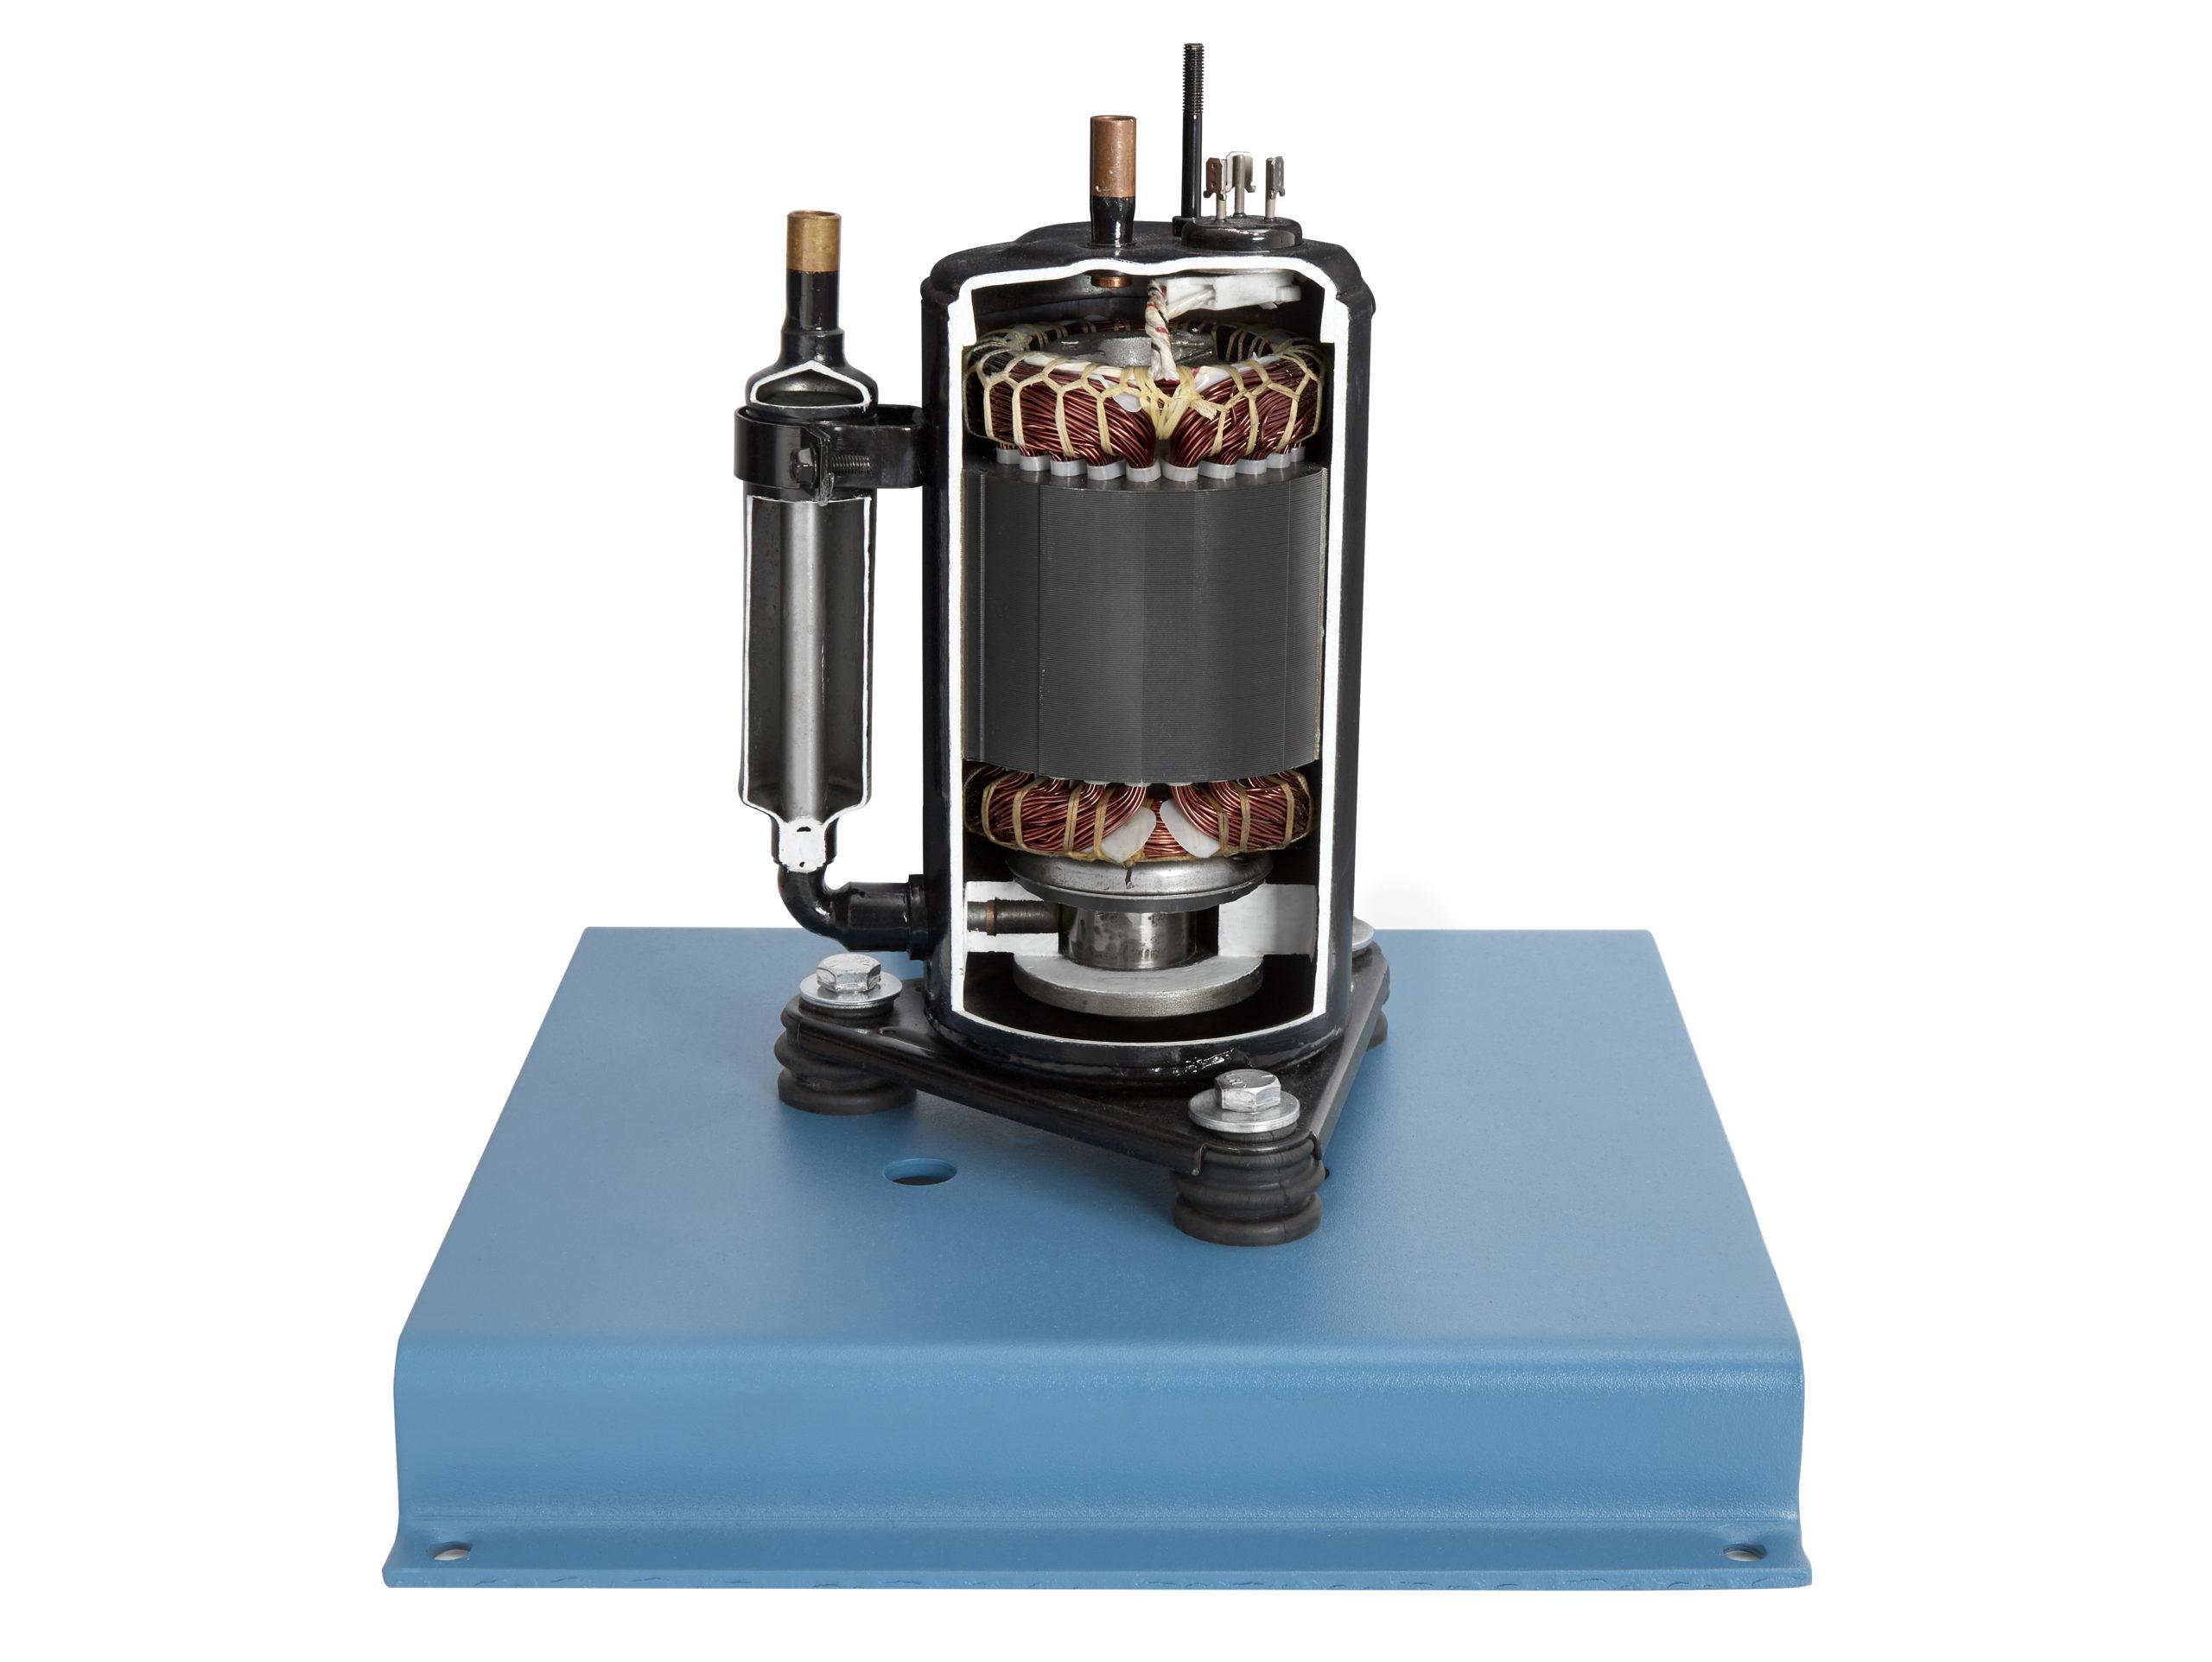 373-160 Hermetic Rotary Compressor Cutaway Image